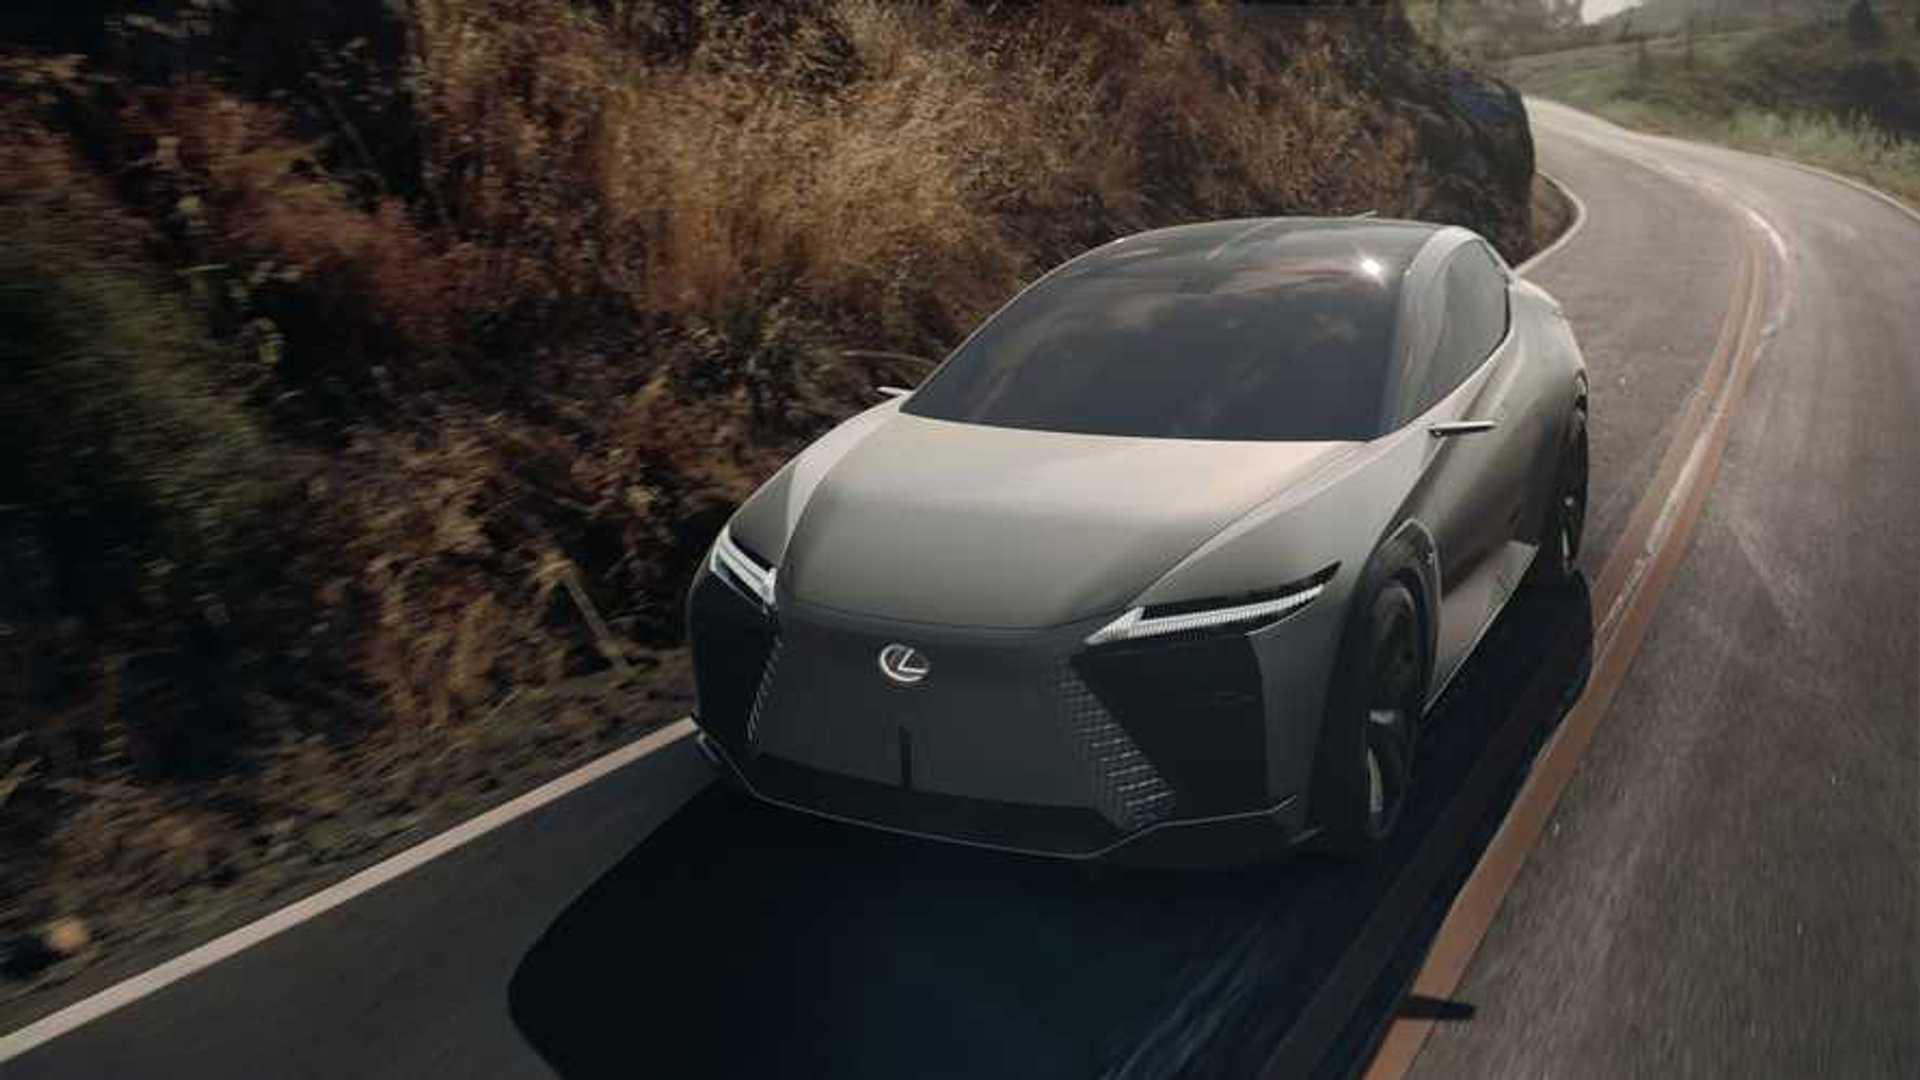 Электромобили Lexus https://cdn.motor1.com/images/mgl/VAbPy/s6/lexus-lf-z-electrified-concept.jpg